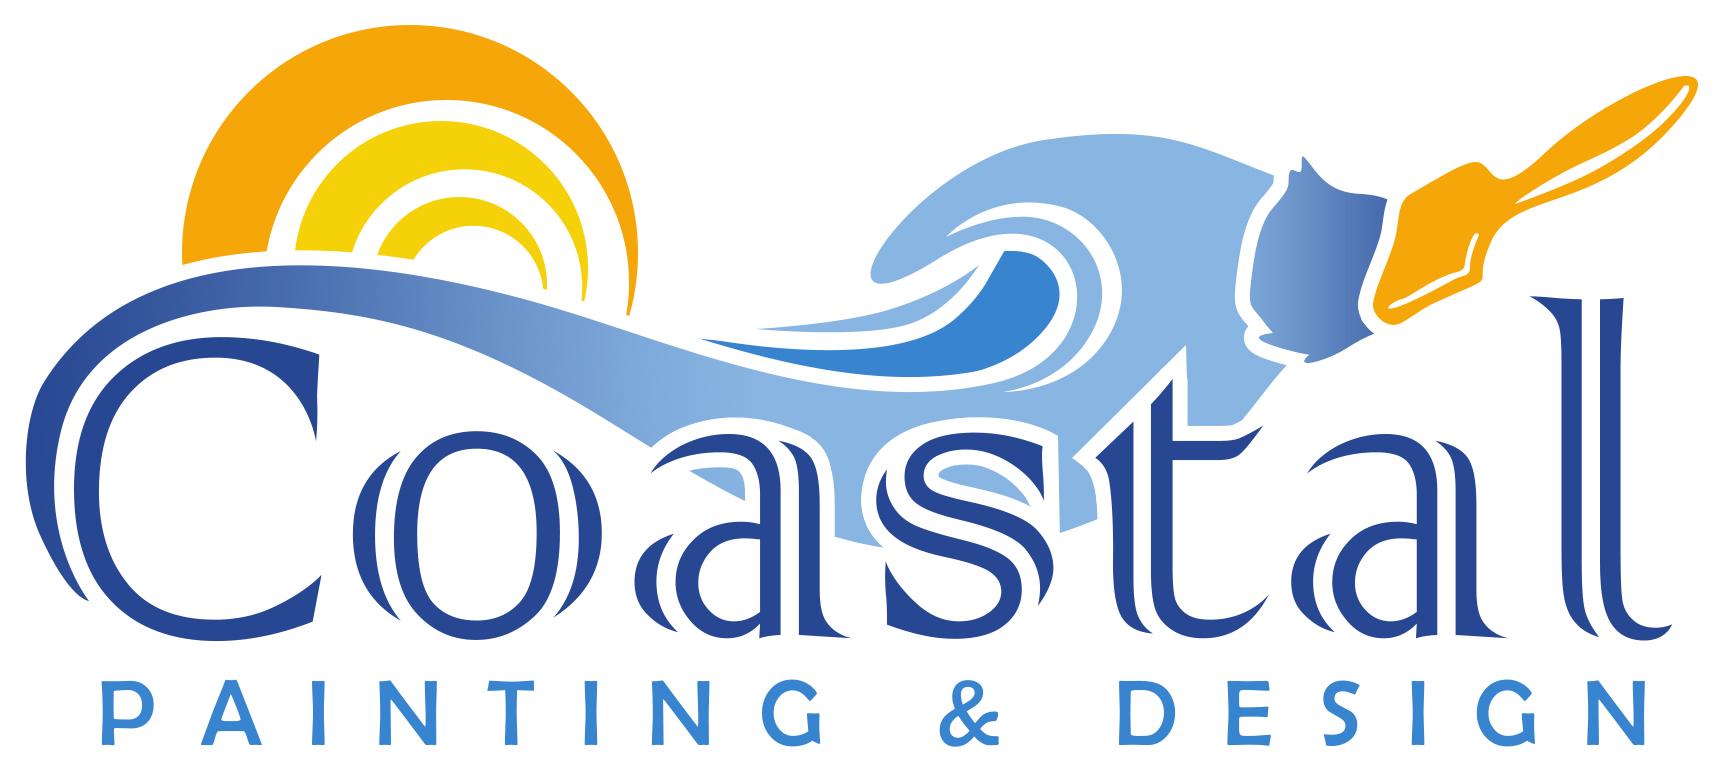 Coastal-Painting-Design-Logo.jpg